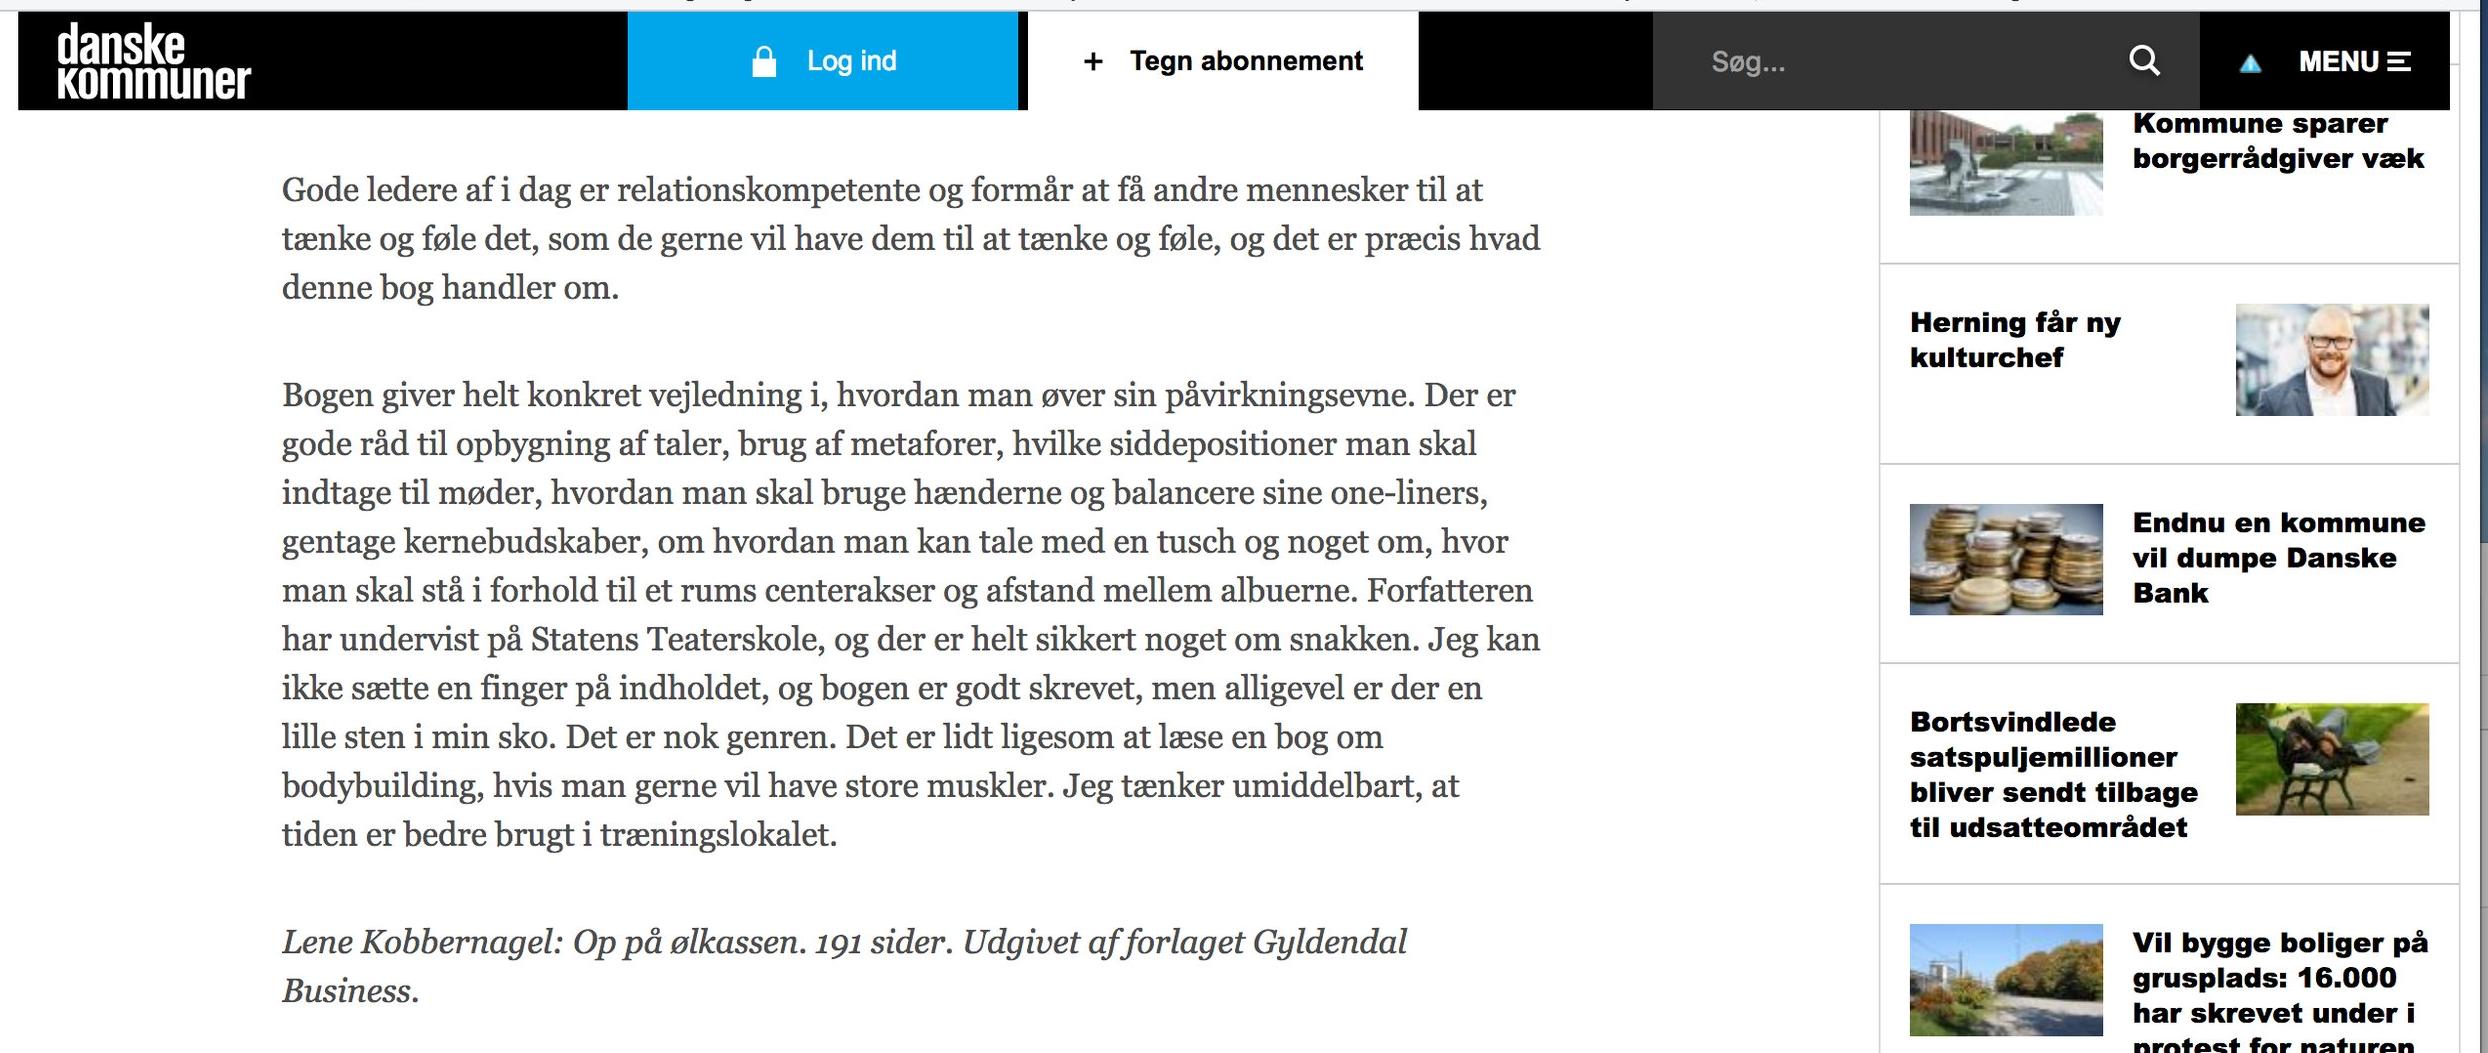 danske kommuner.jpg